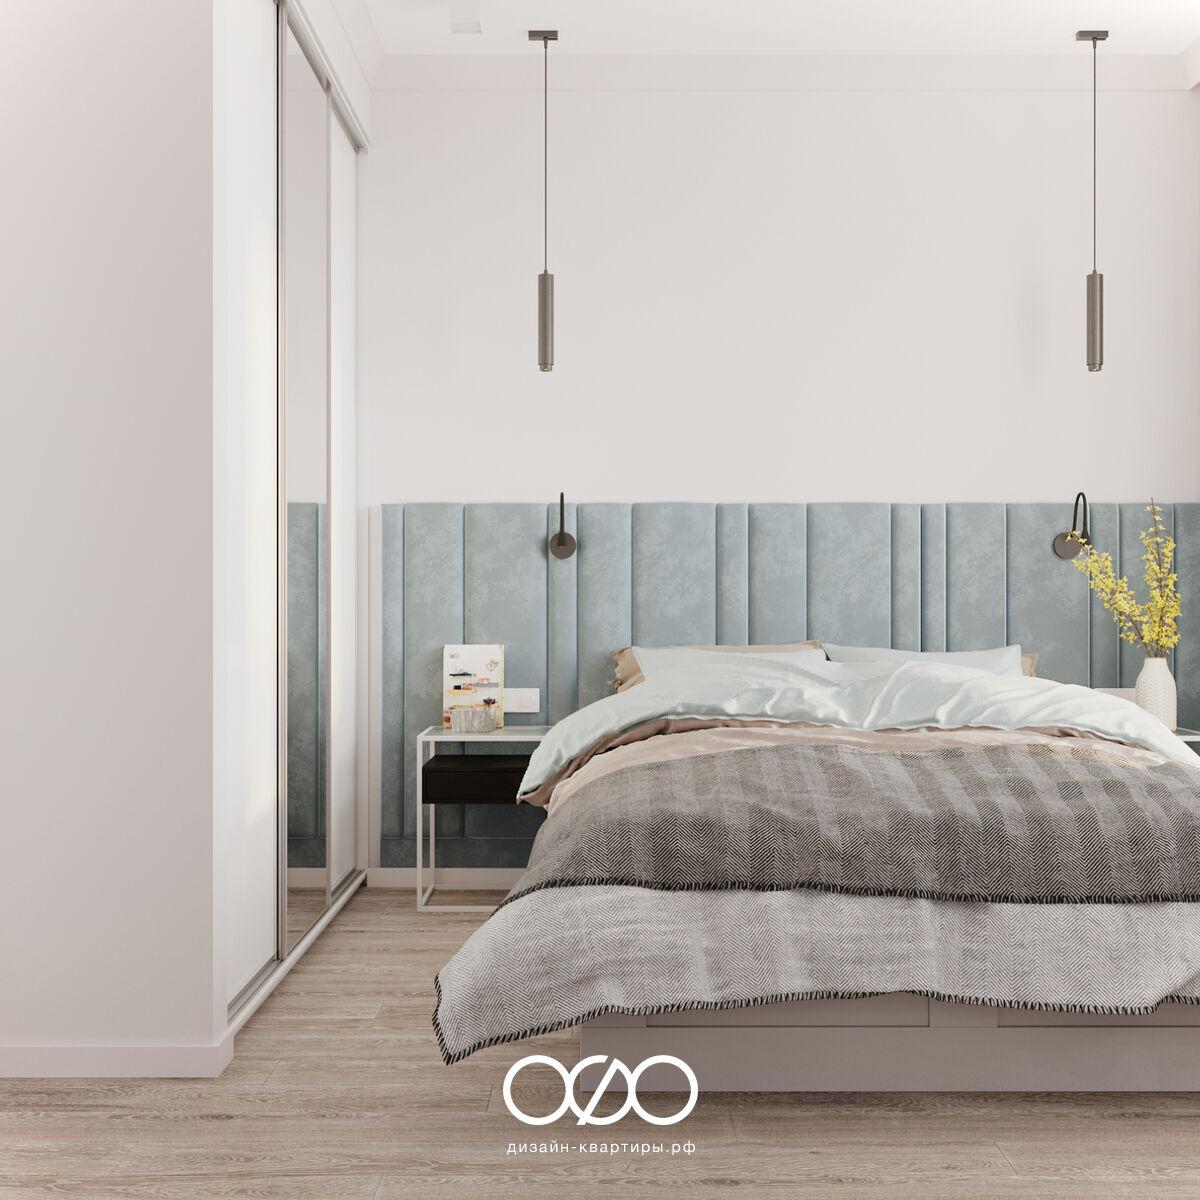 Дизайн спальни со шкафом